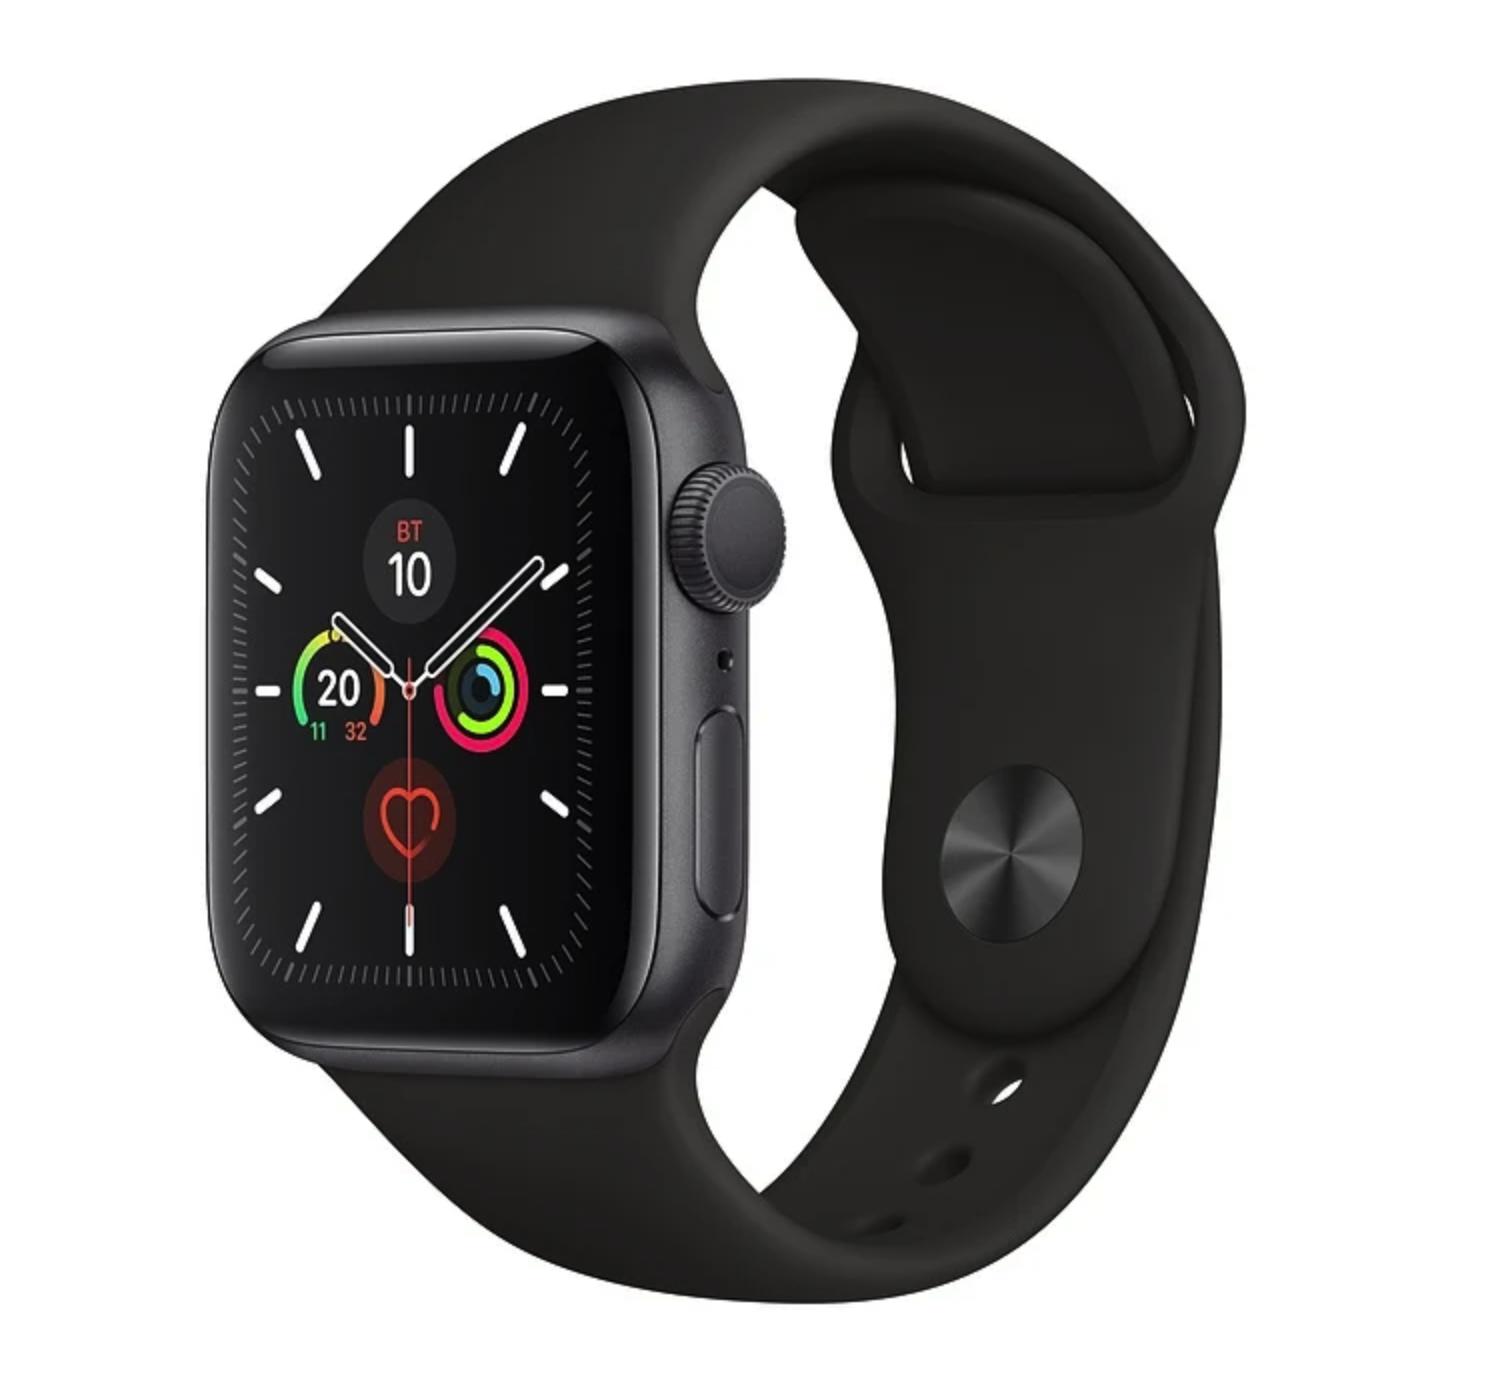 Часы Apple Watch Series 5 GPS 40mm Aluminum Case with Sport Band Space Gray (серый космос/черный)